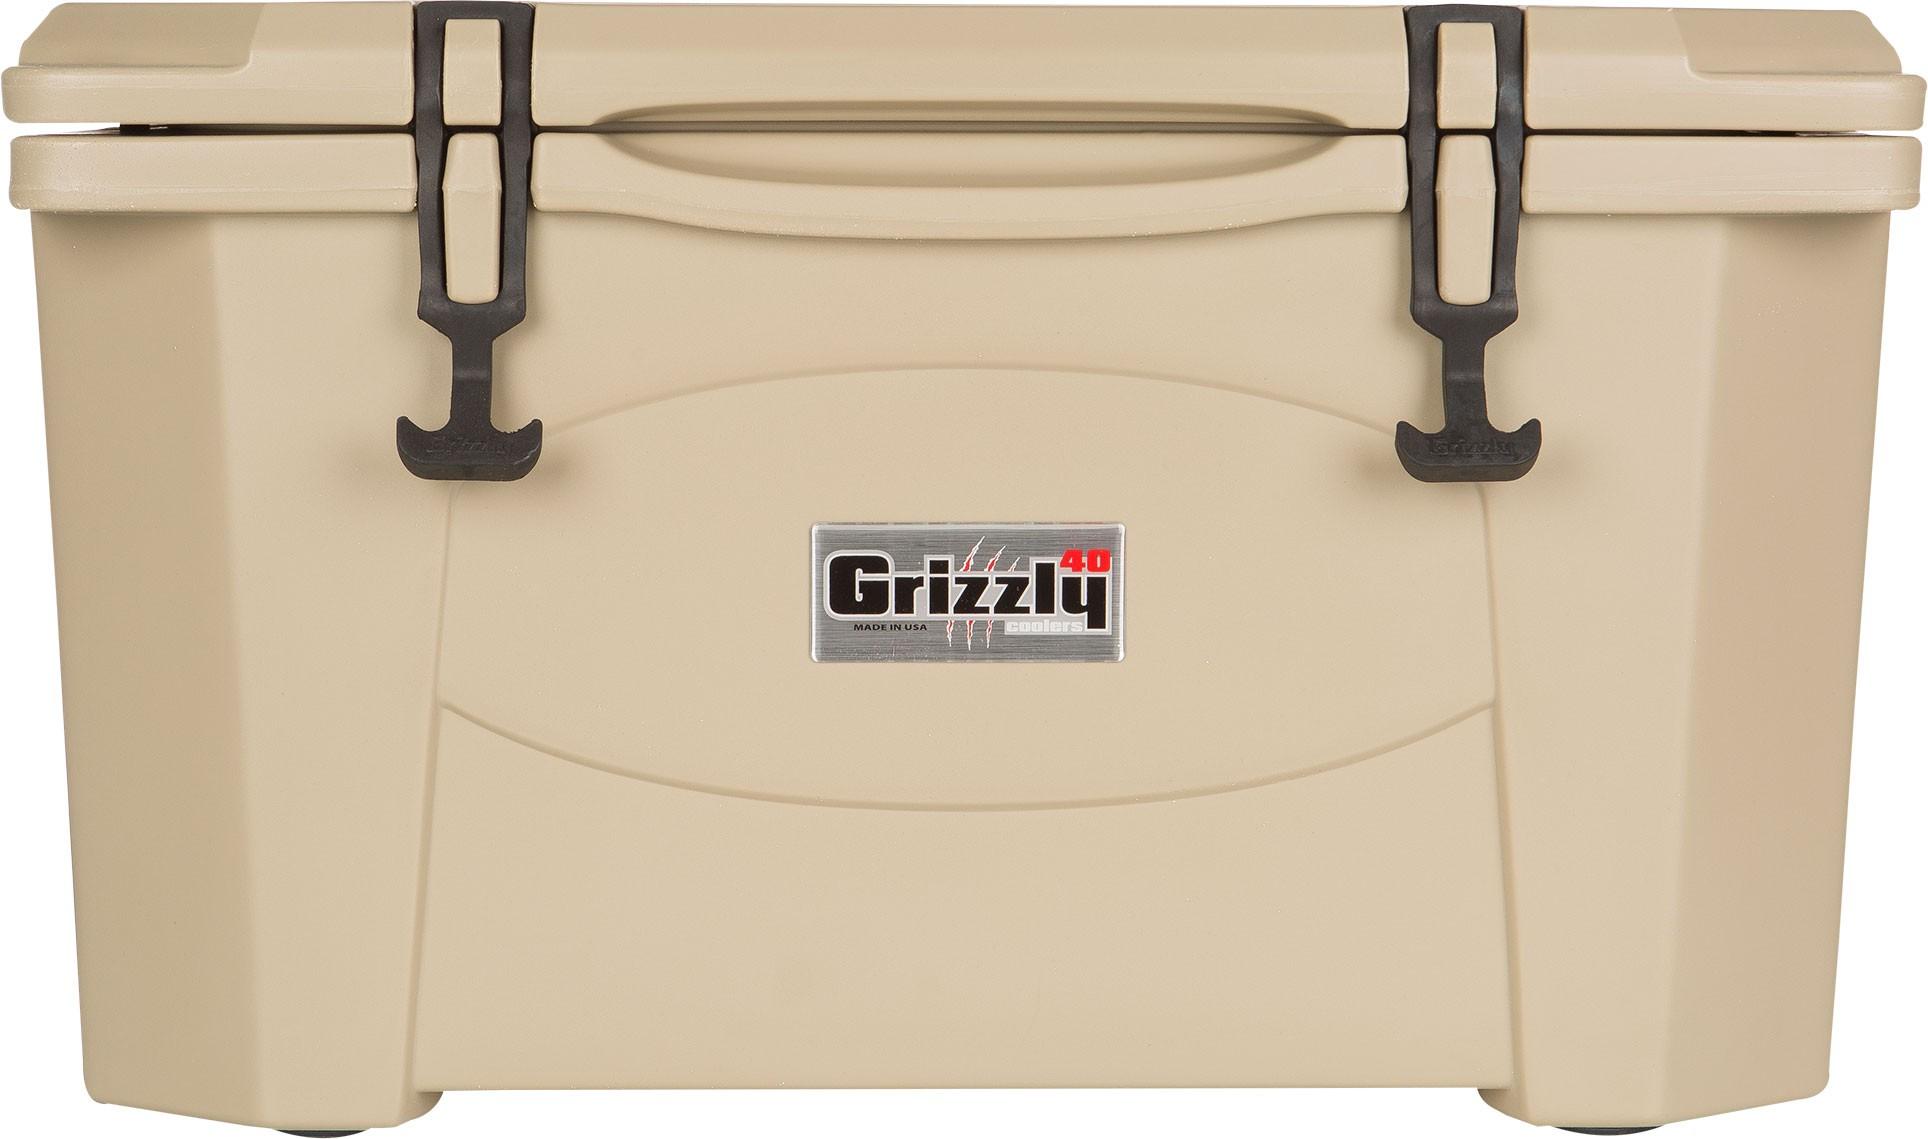 grizzly40deserttanstraight.jpg